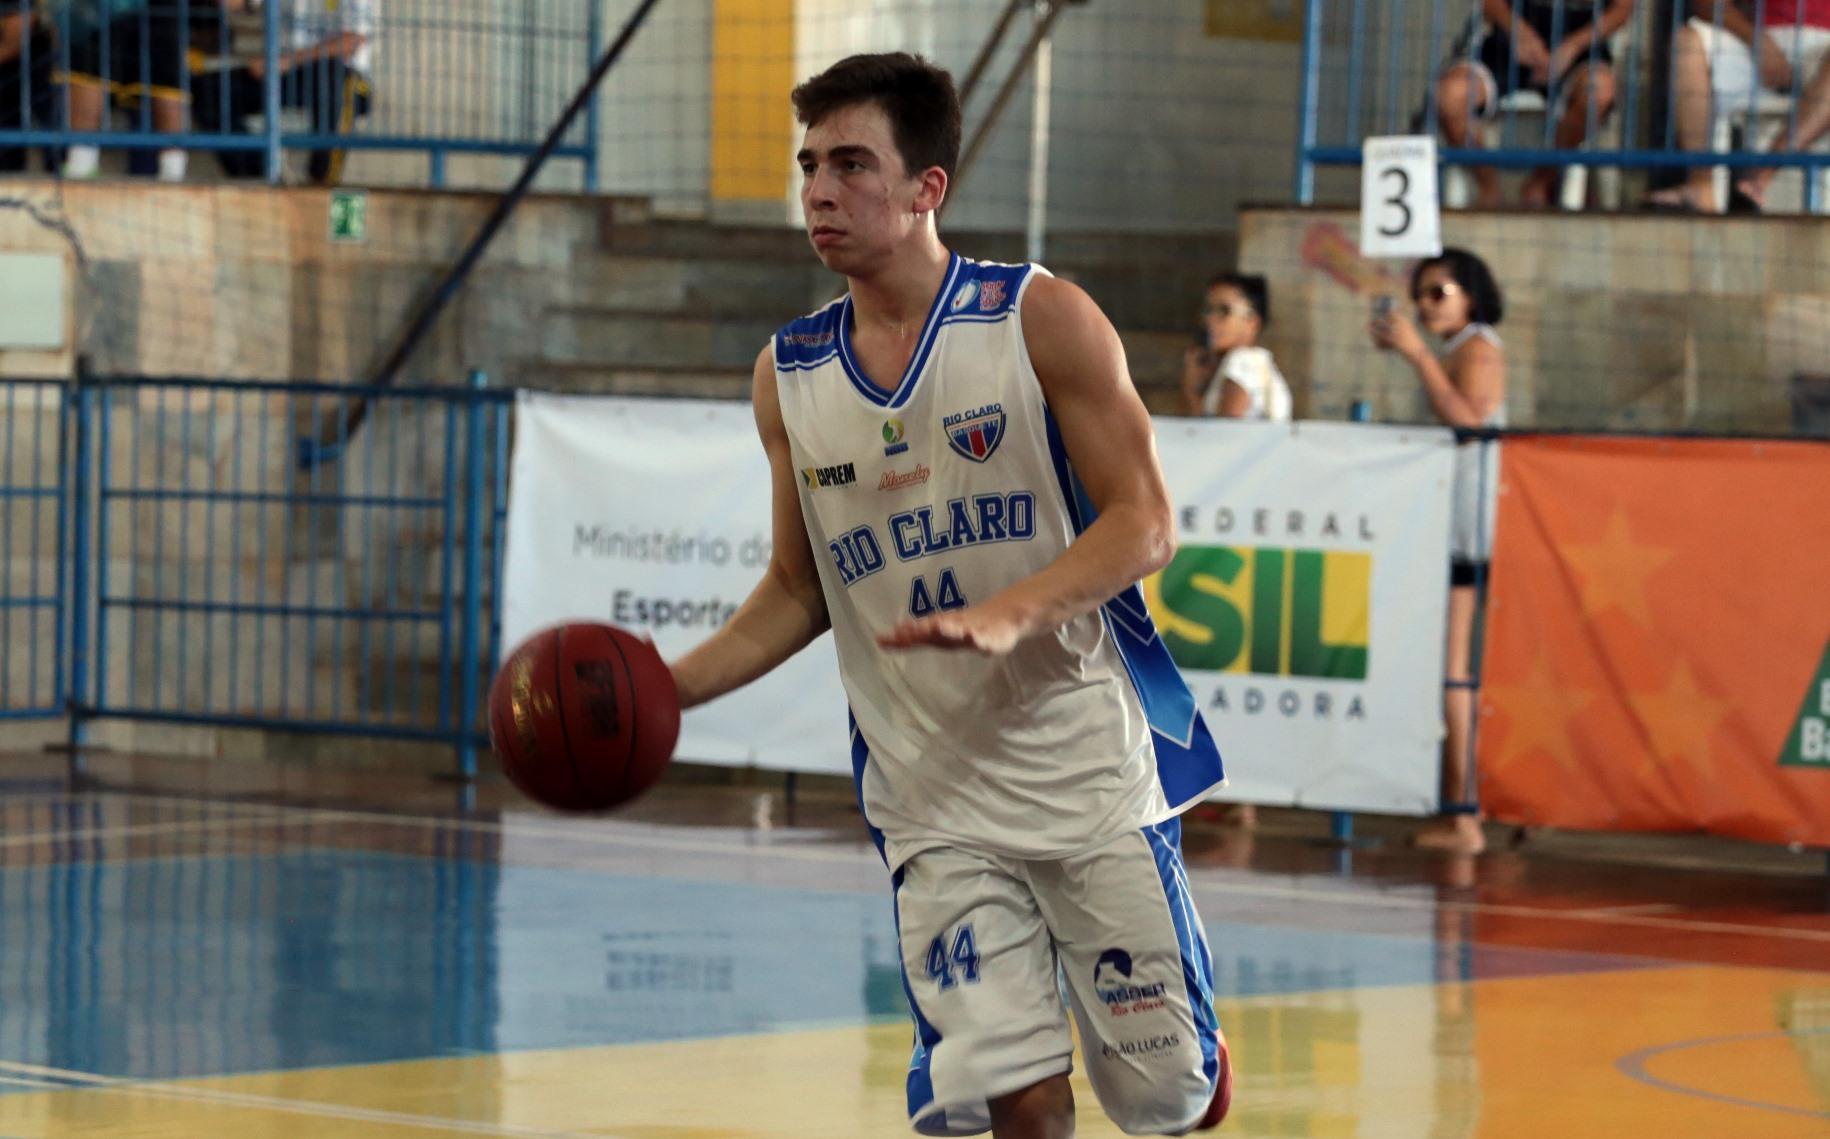 Rio Claro, do ala Assmann, manteve a invencibilidade na LDB ao vencer o Macaé (Raphael Oliveira/LNB)